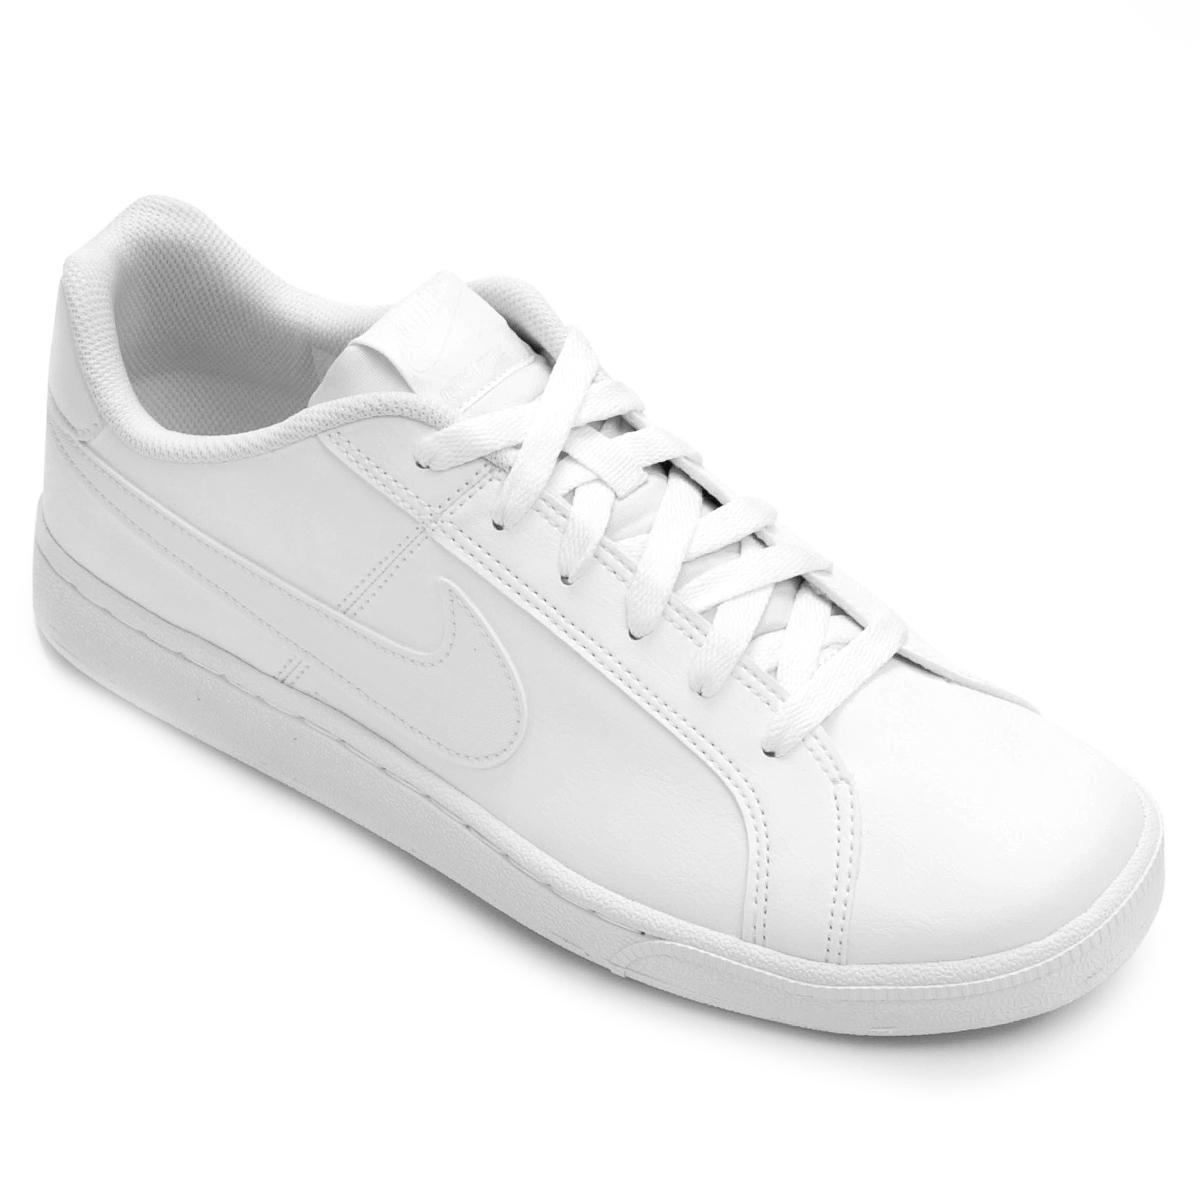 a50463c1b9 Tênis Couro Nike Court Royale Masculino - Branco - Compre Agora ...